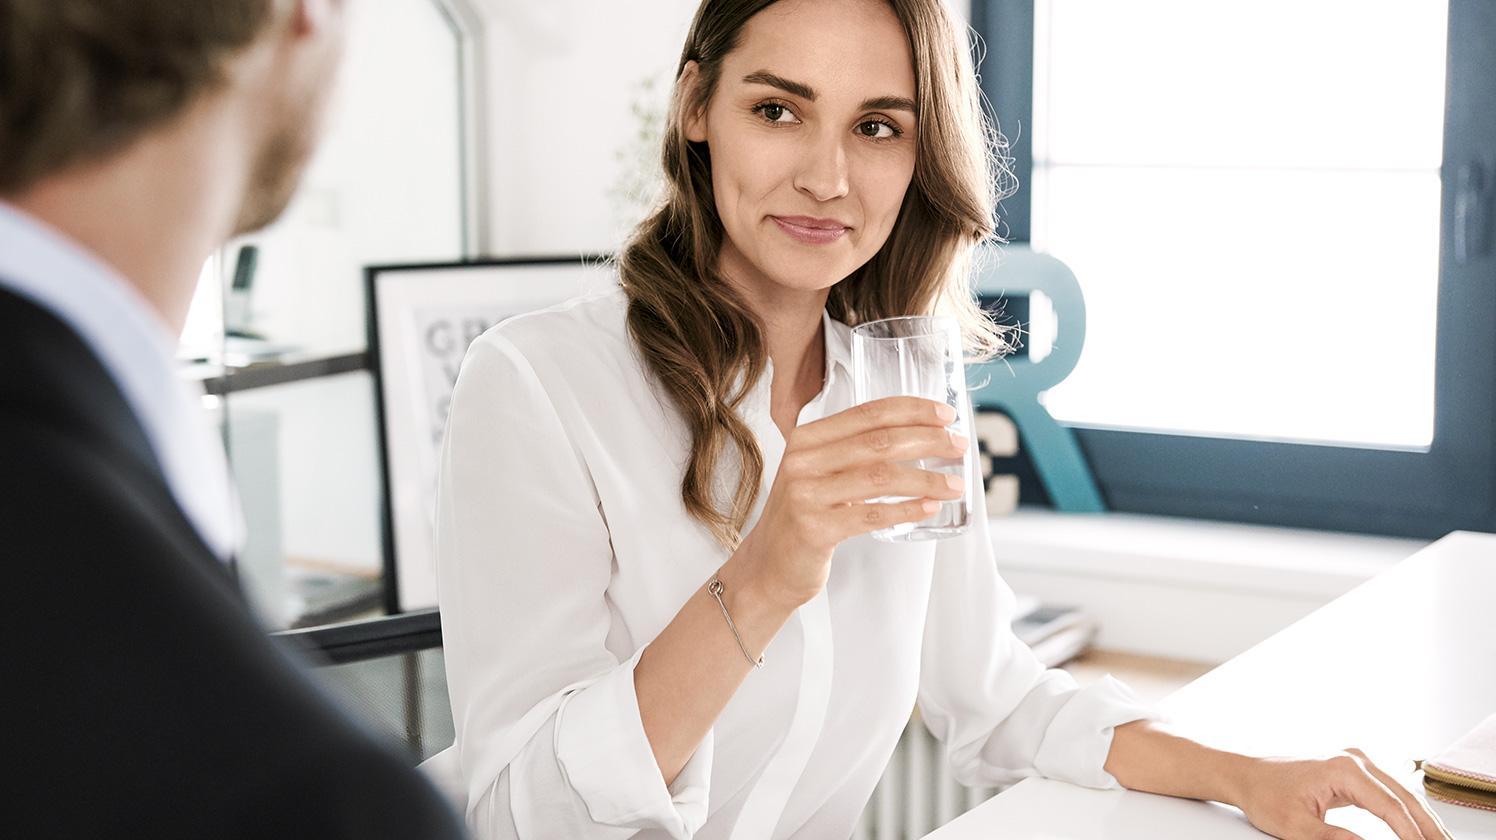 BRITA water dispenser refreshment at work